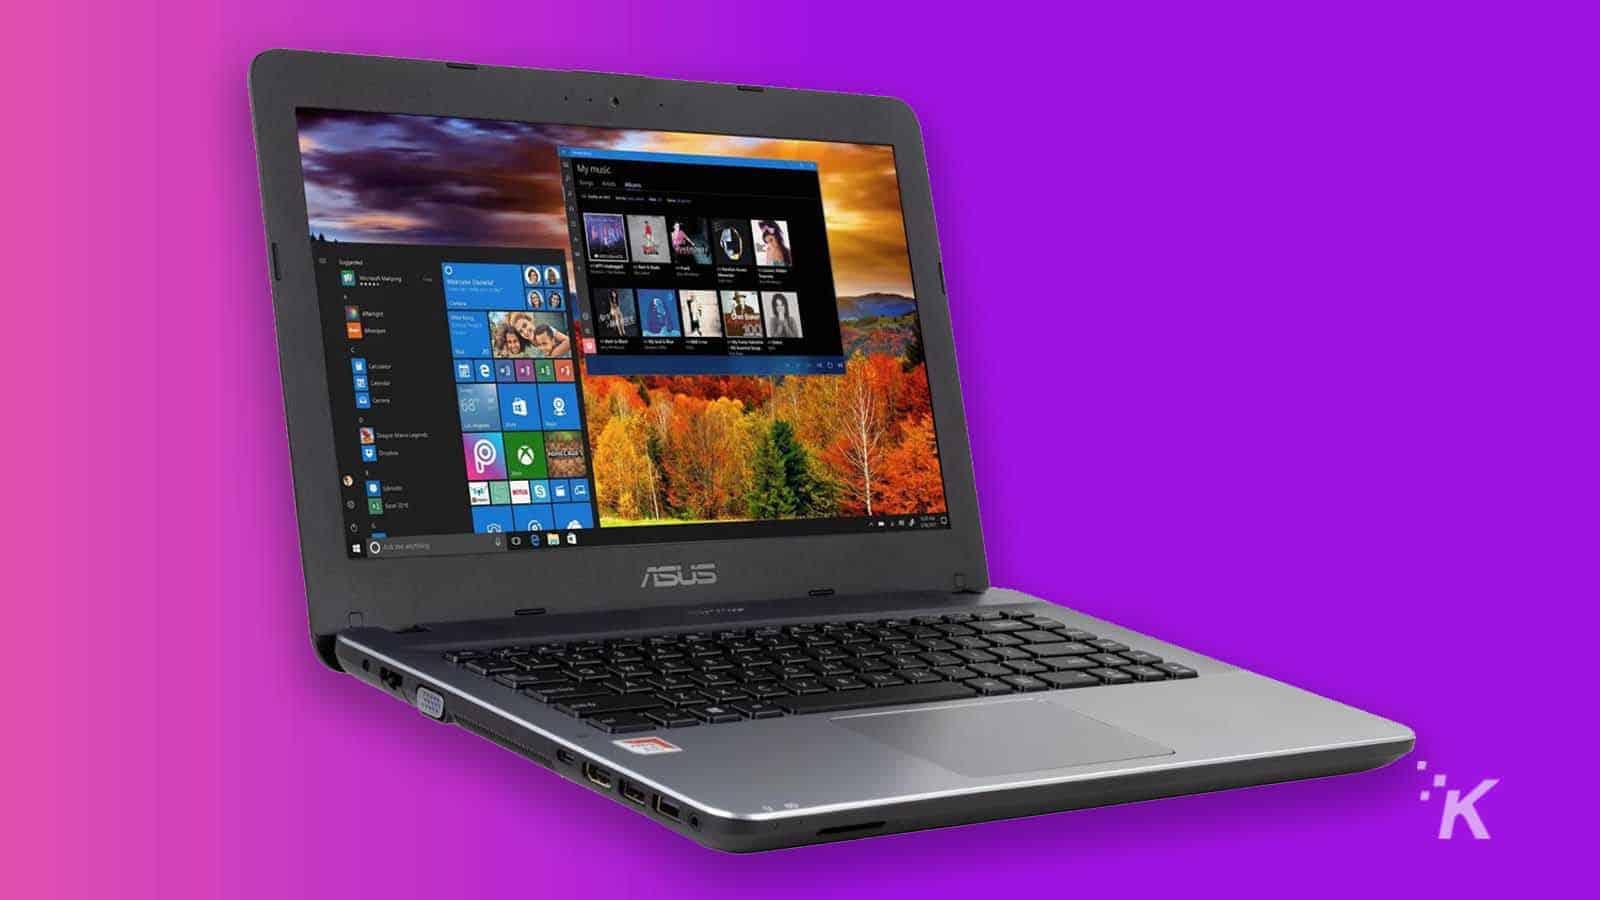 asus laptop on purple background